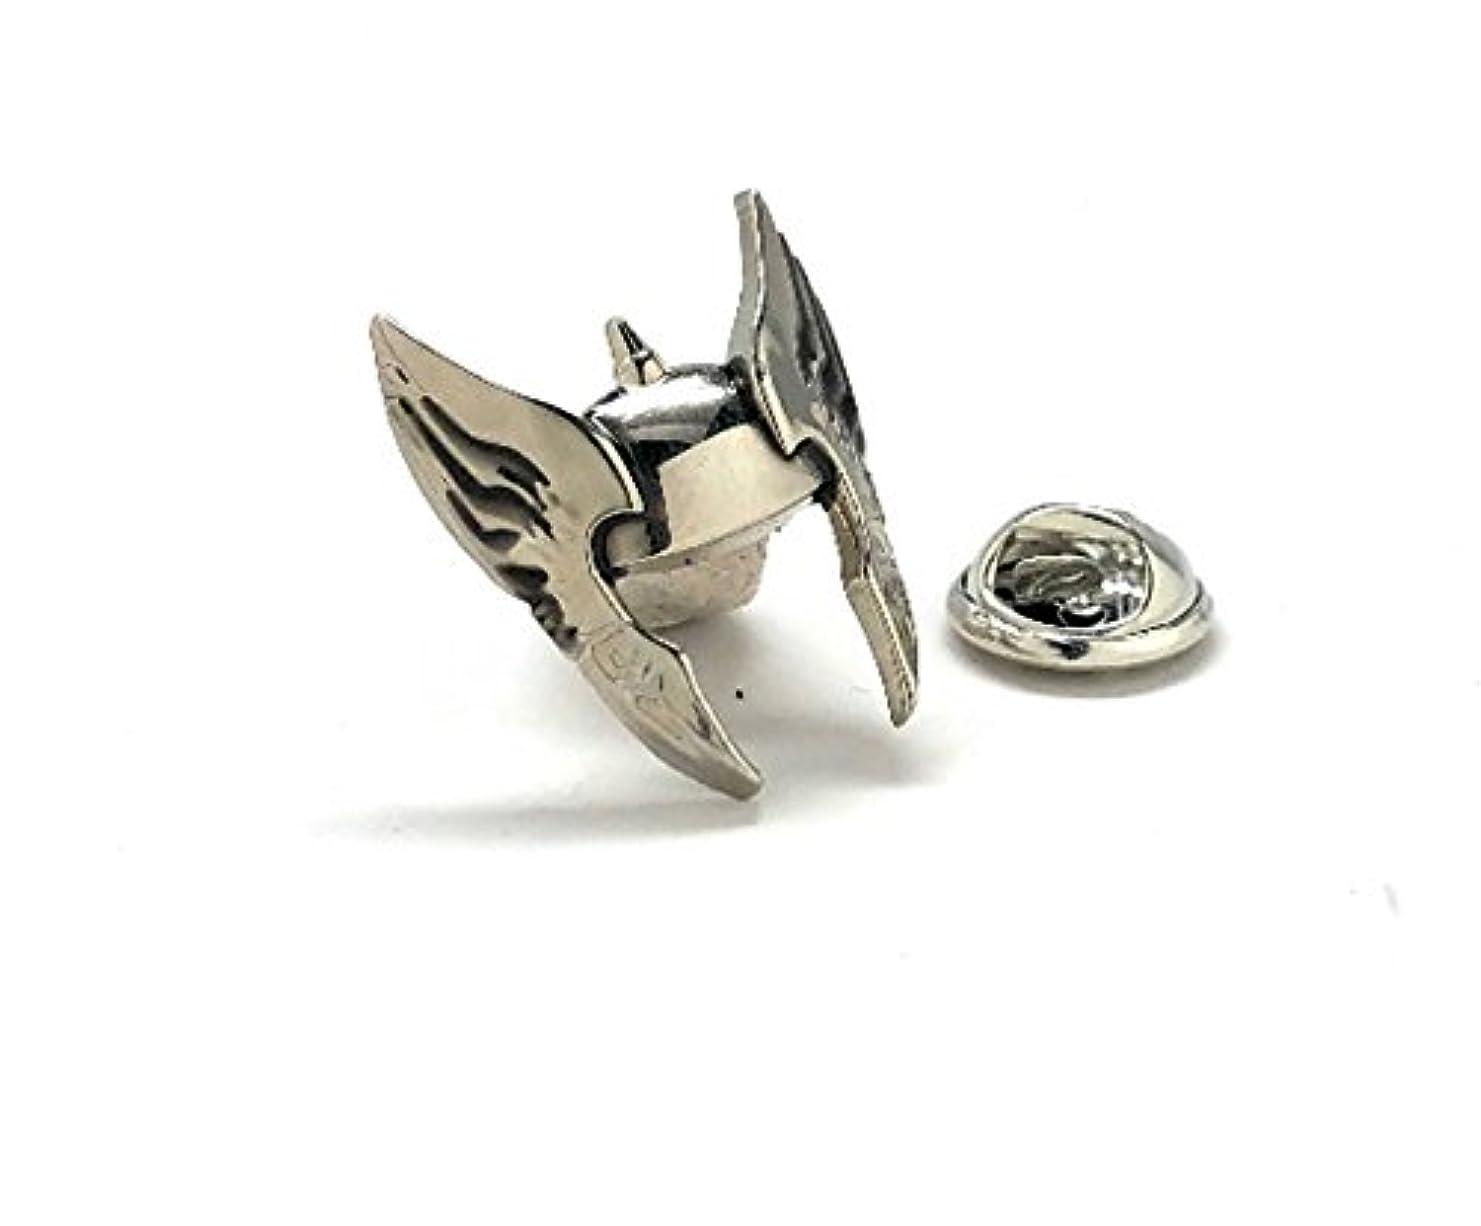 Men's Executive Lapel Pin Norse Thor Mythology Warrior Helmet Lapel Pin Helmet Cool Wing Detailed Design Tie Tac